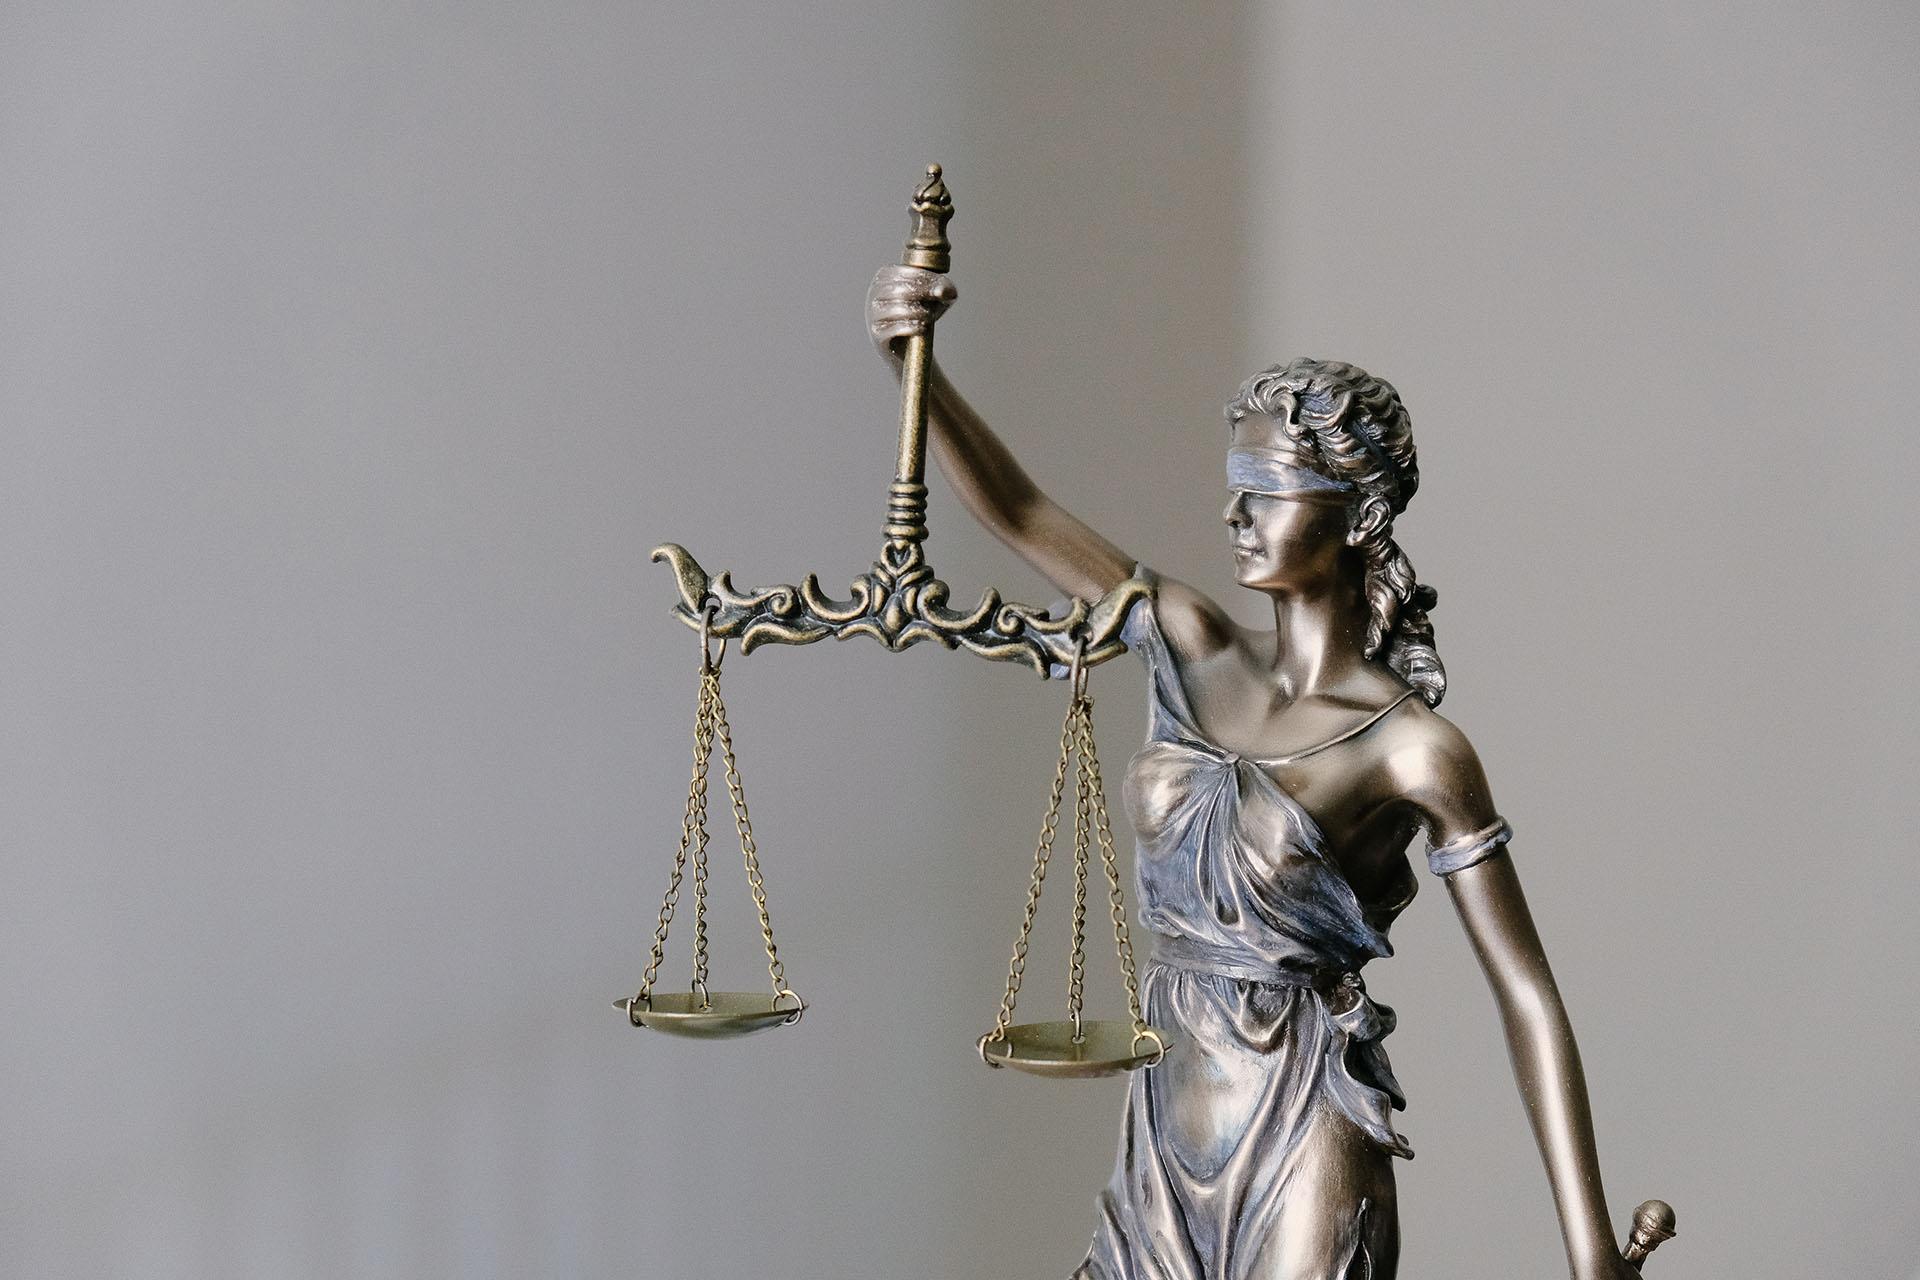 Boletim OA - opinião - Corrupção em Portugal ©Tingey Injury Law Firm - Unsplash